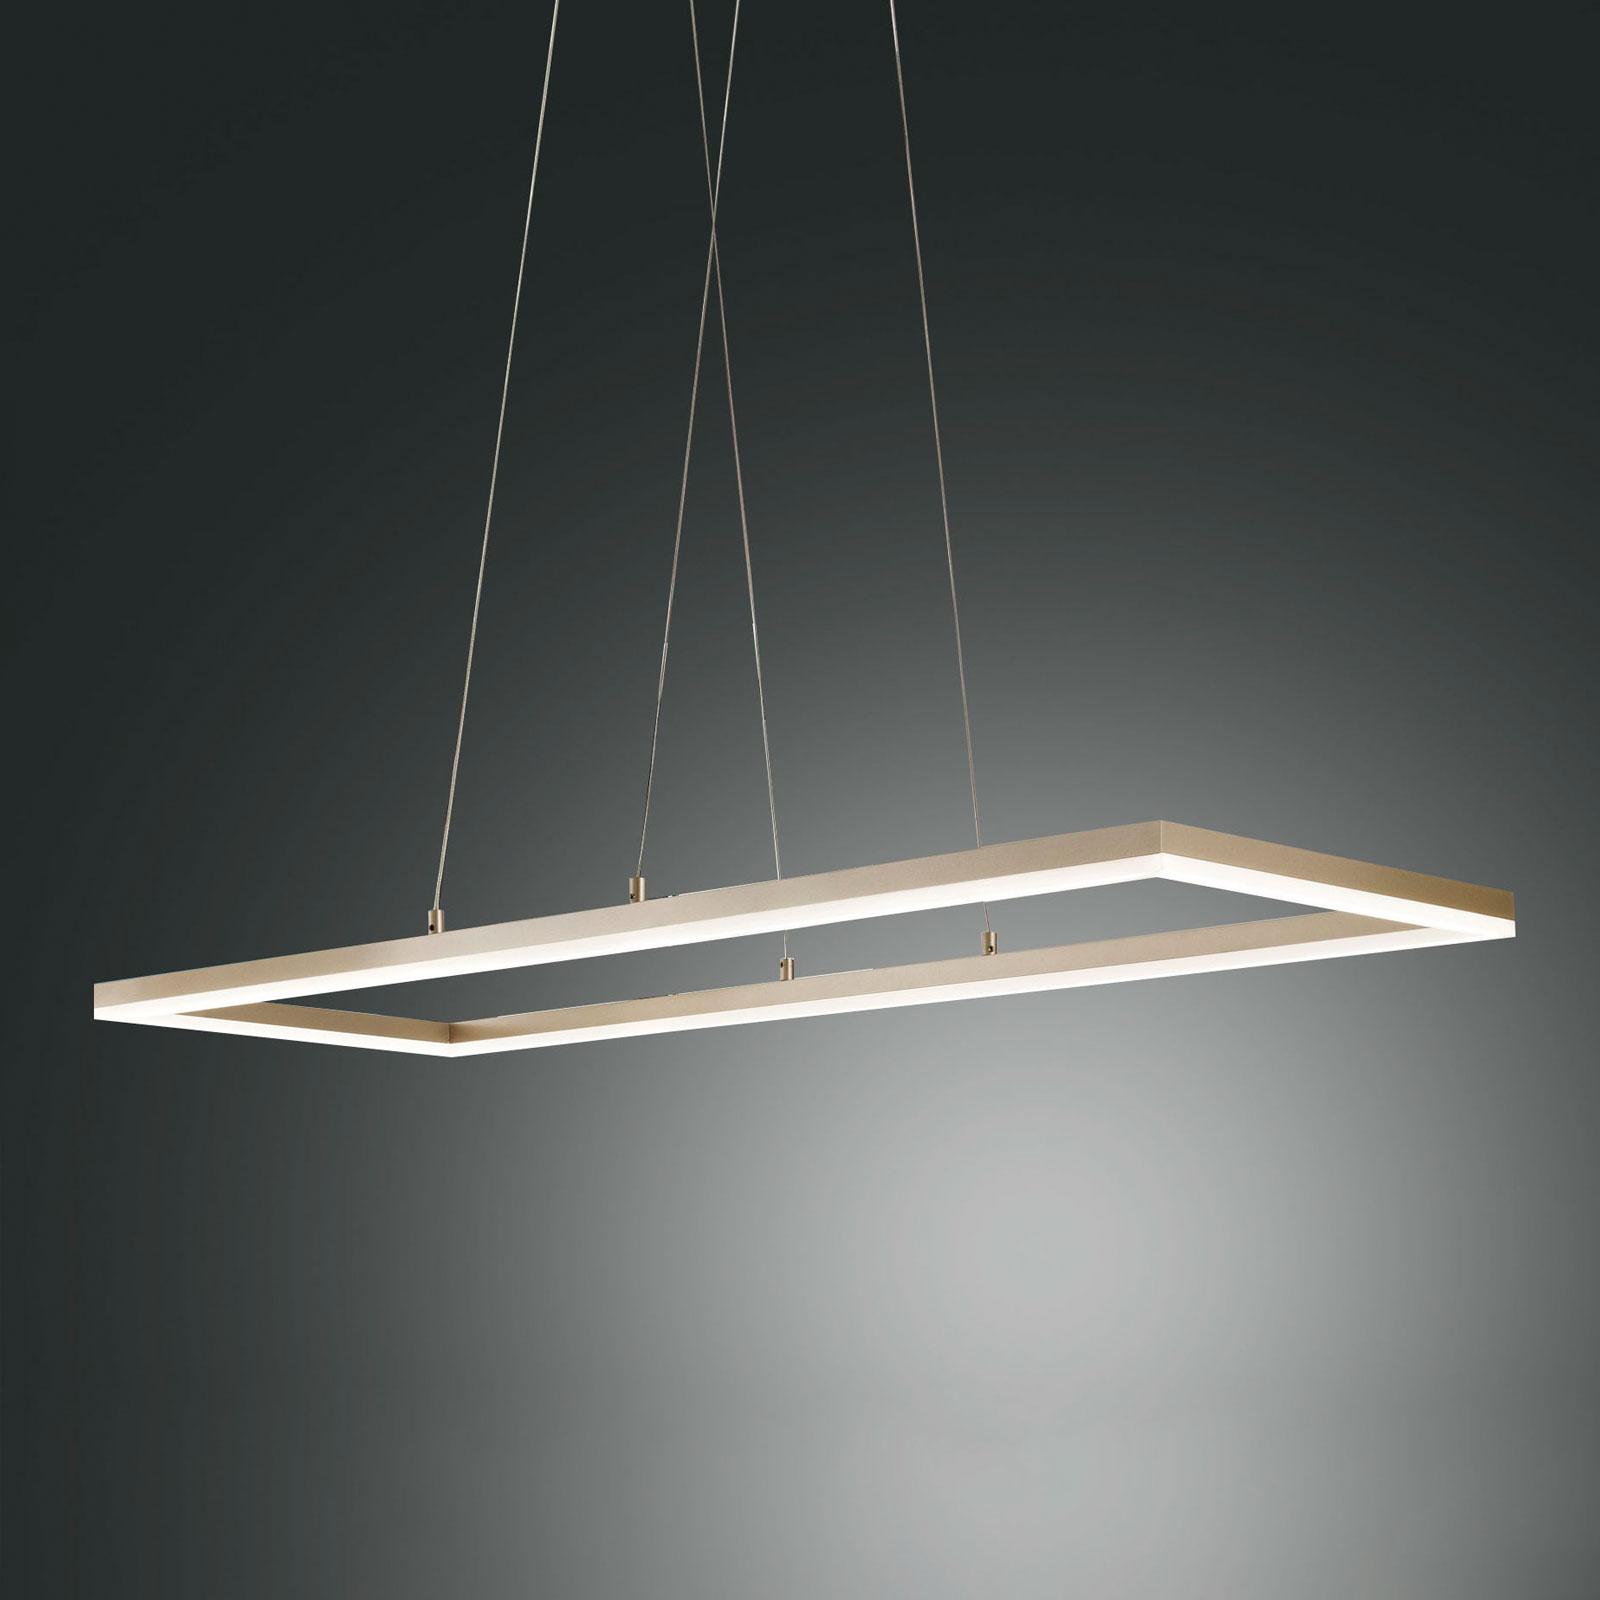 LED-Pendelleuchte Bard, 92x32cm in Mattgold-Finish